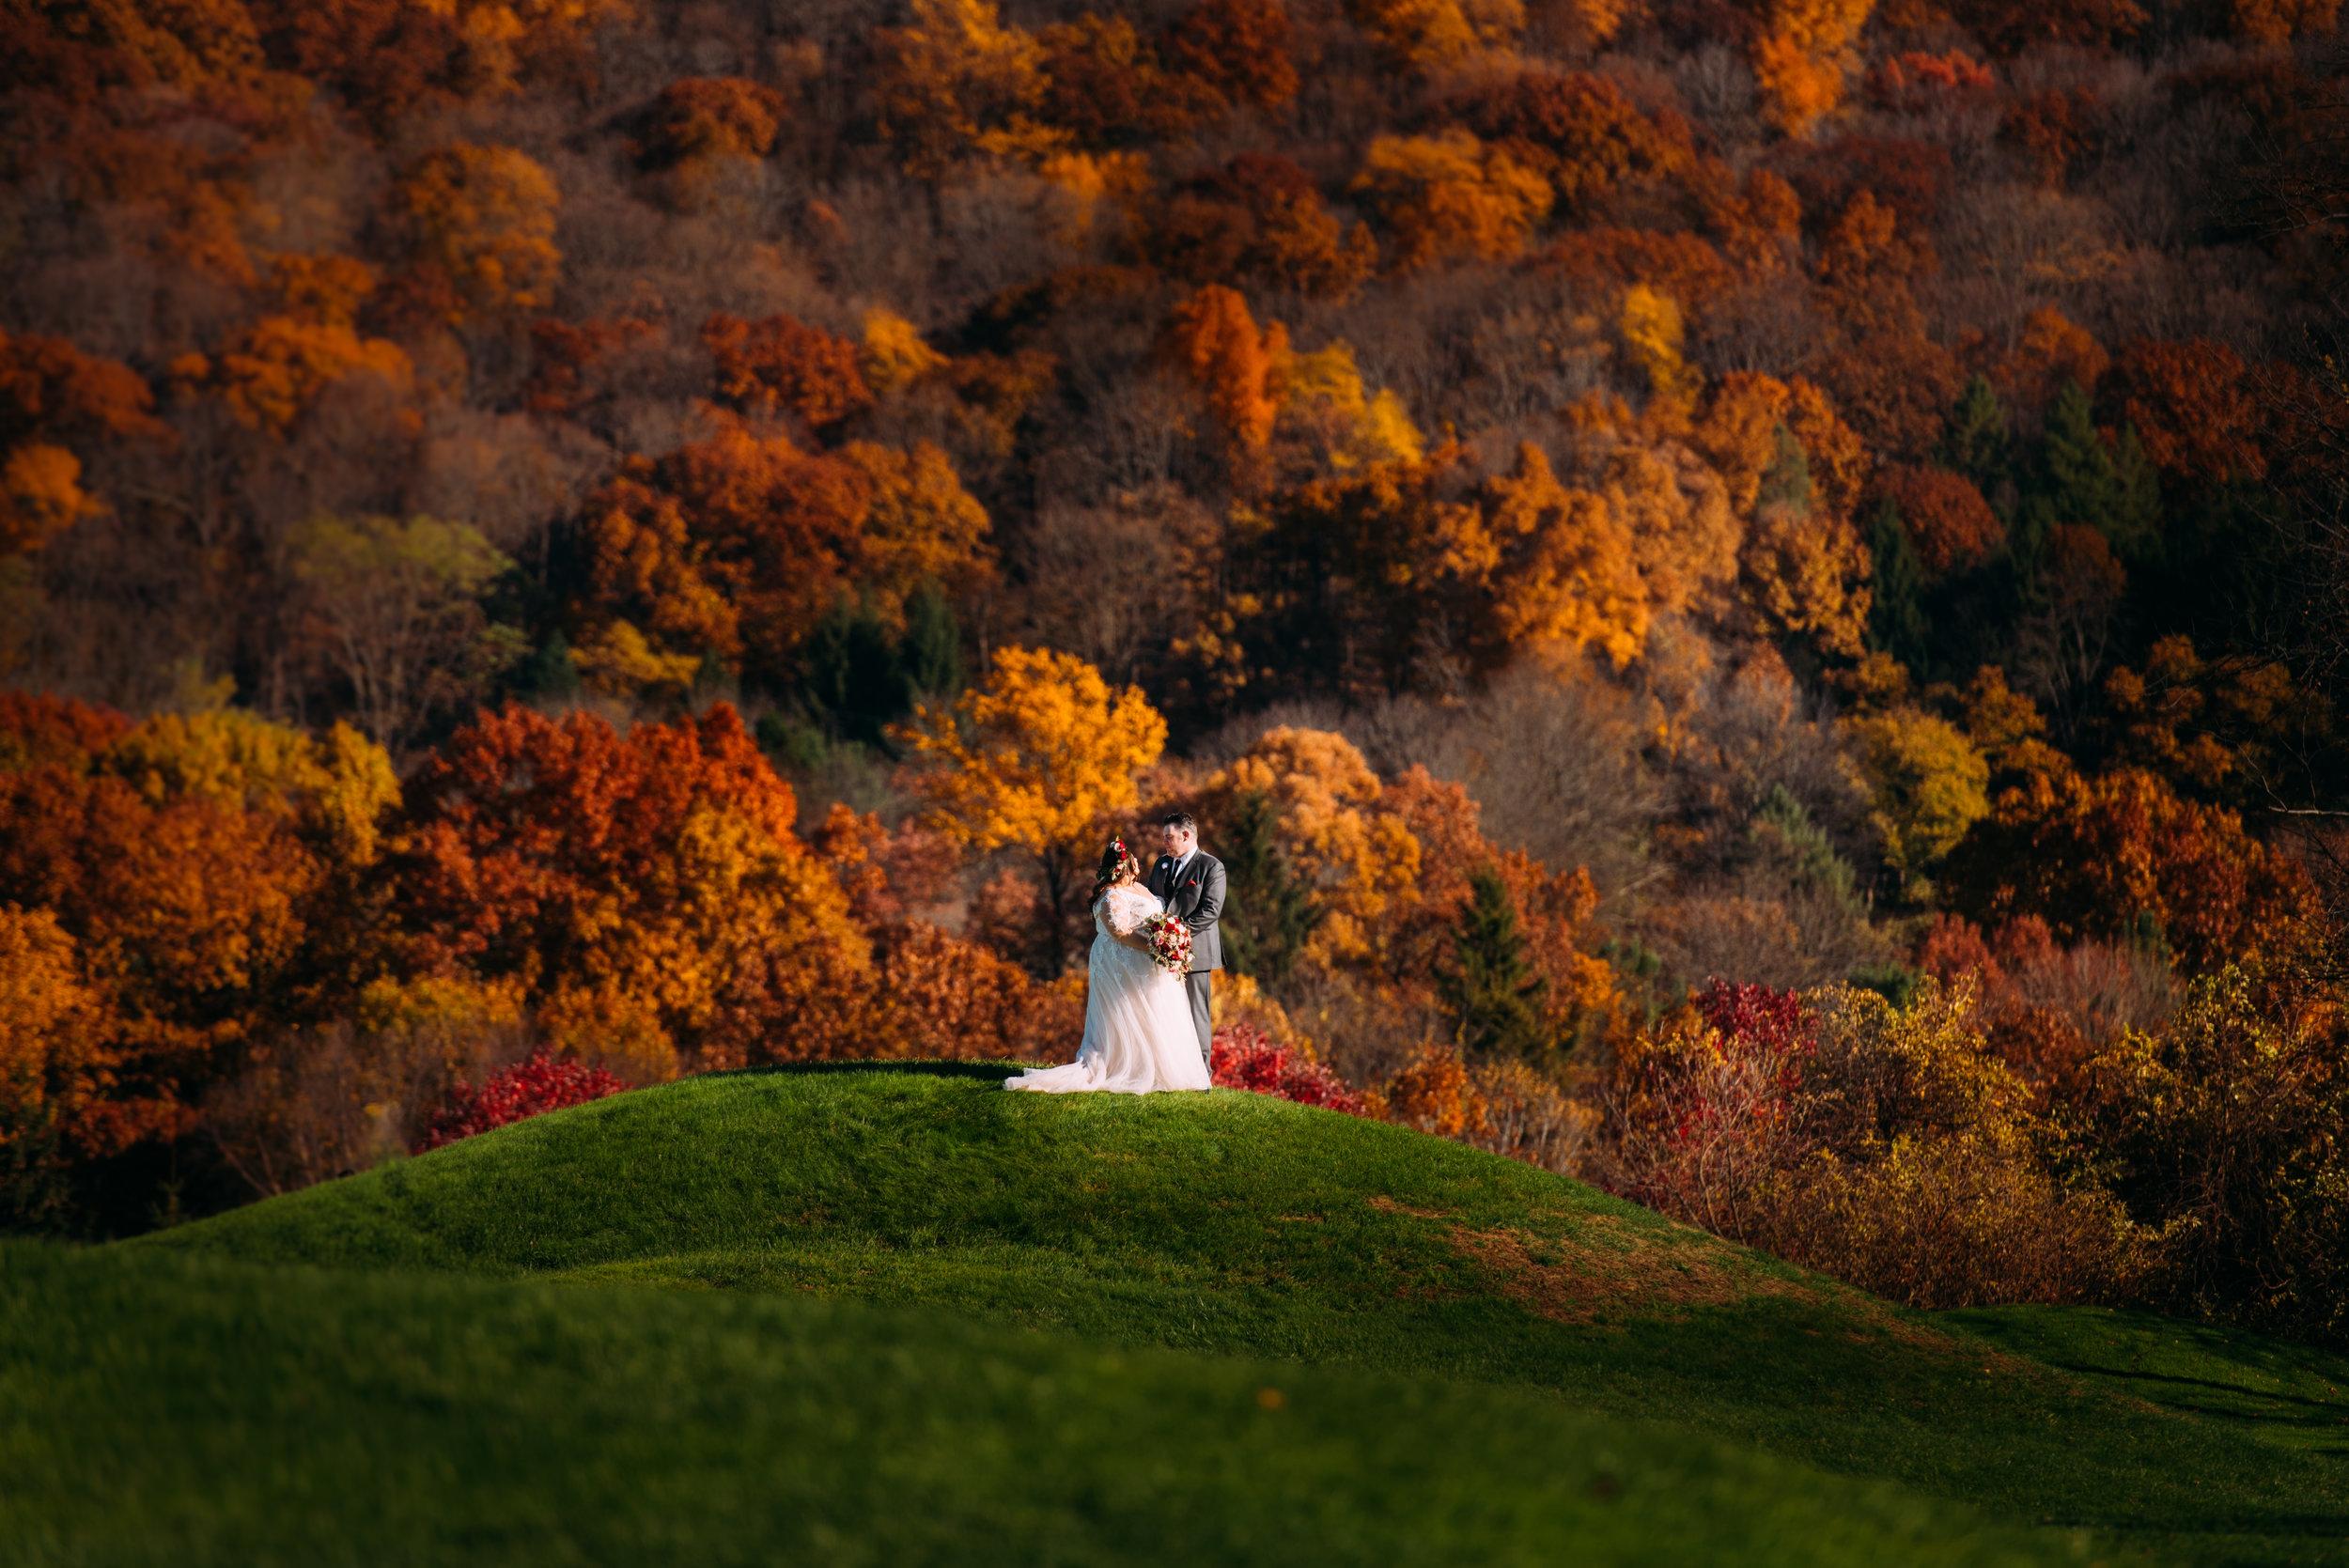 WeddingPhotos | NJPhotographer | Highlights-8-30.jpg